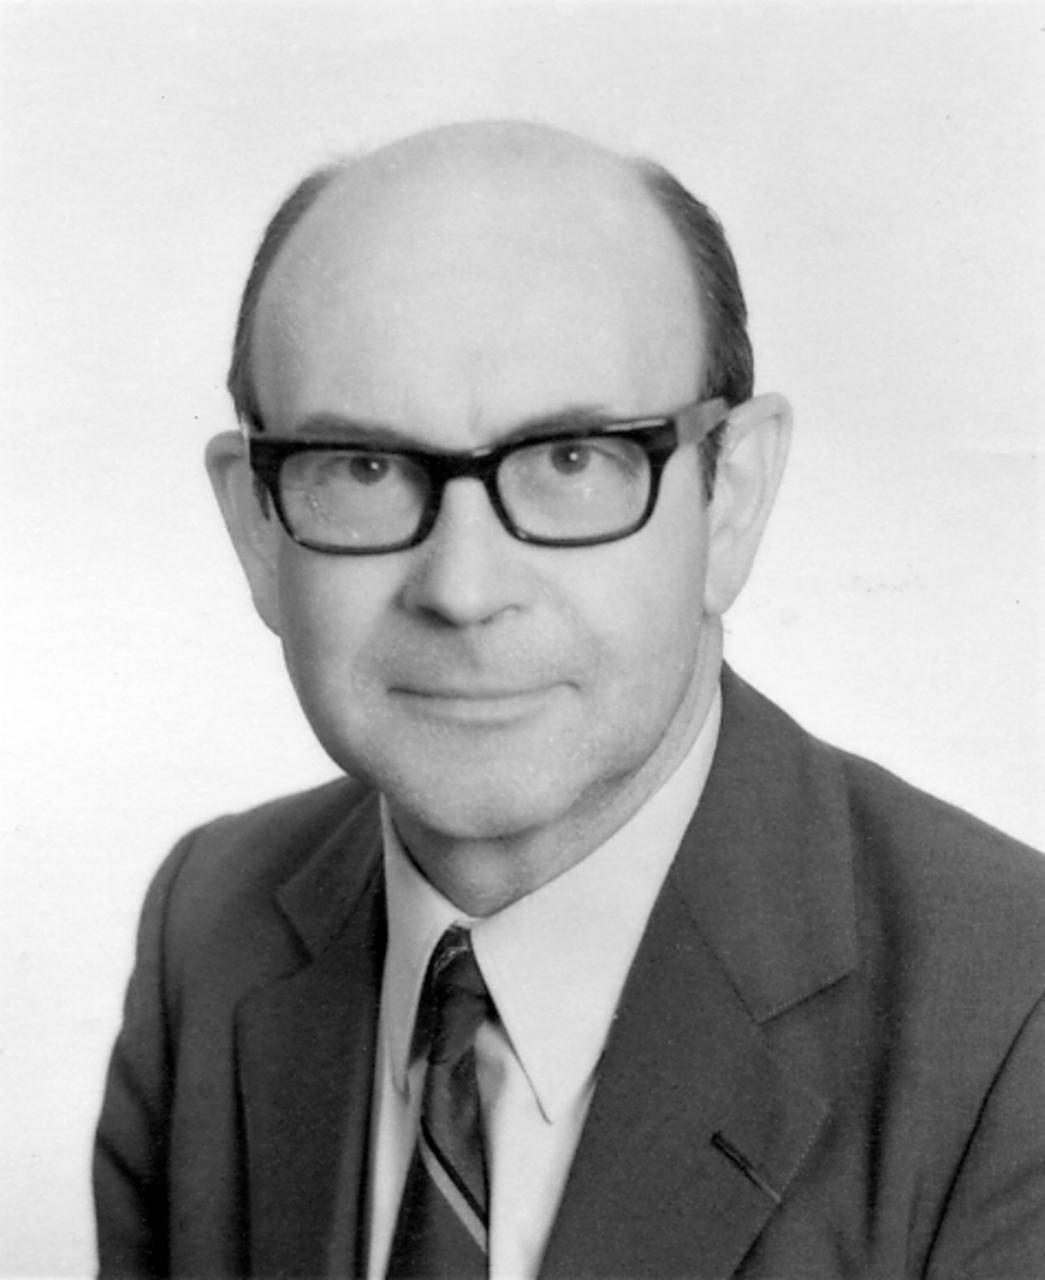 image for Renard, Jean-Claude (1922-2002)